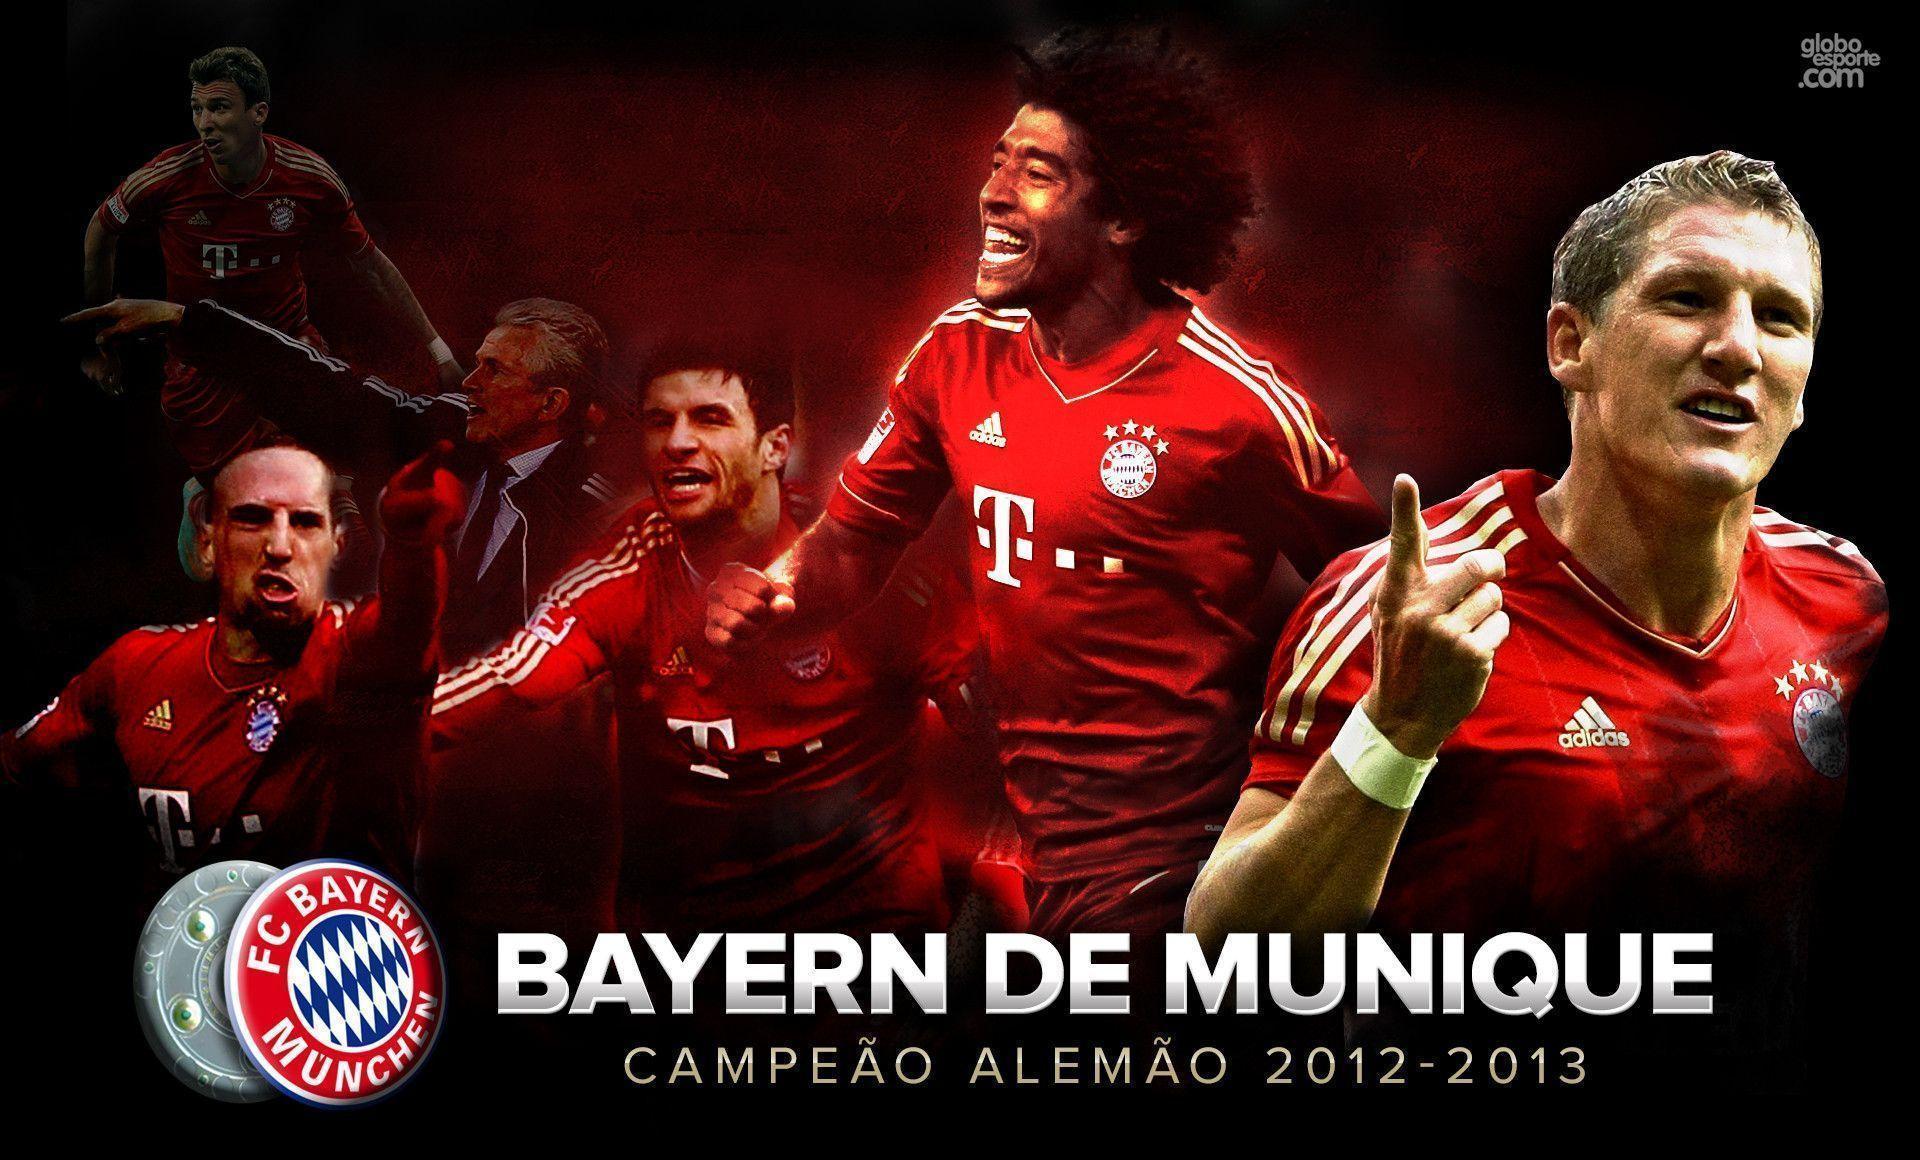 Bayern Munich Squad 2015 Wallpapers #12339 Wallpaper   Cool ...